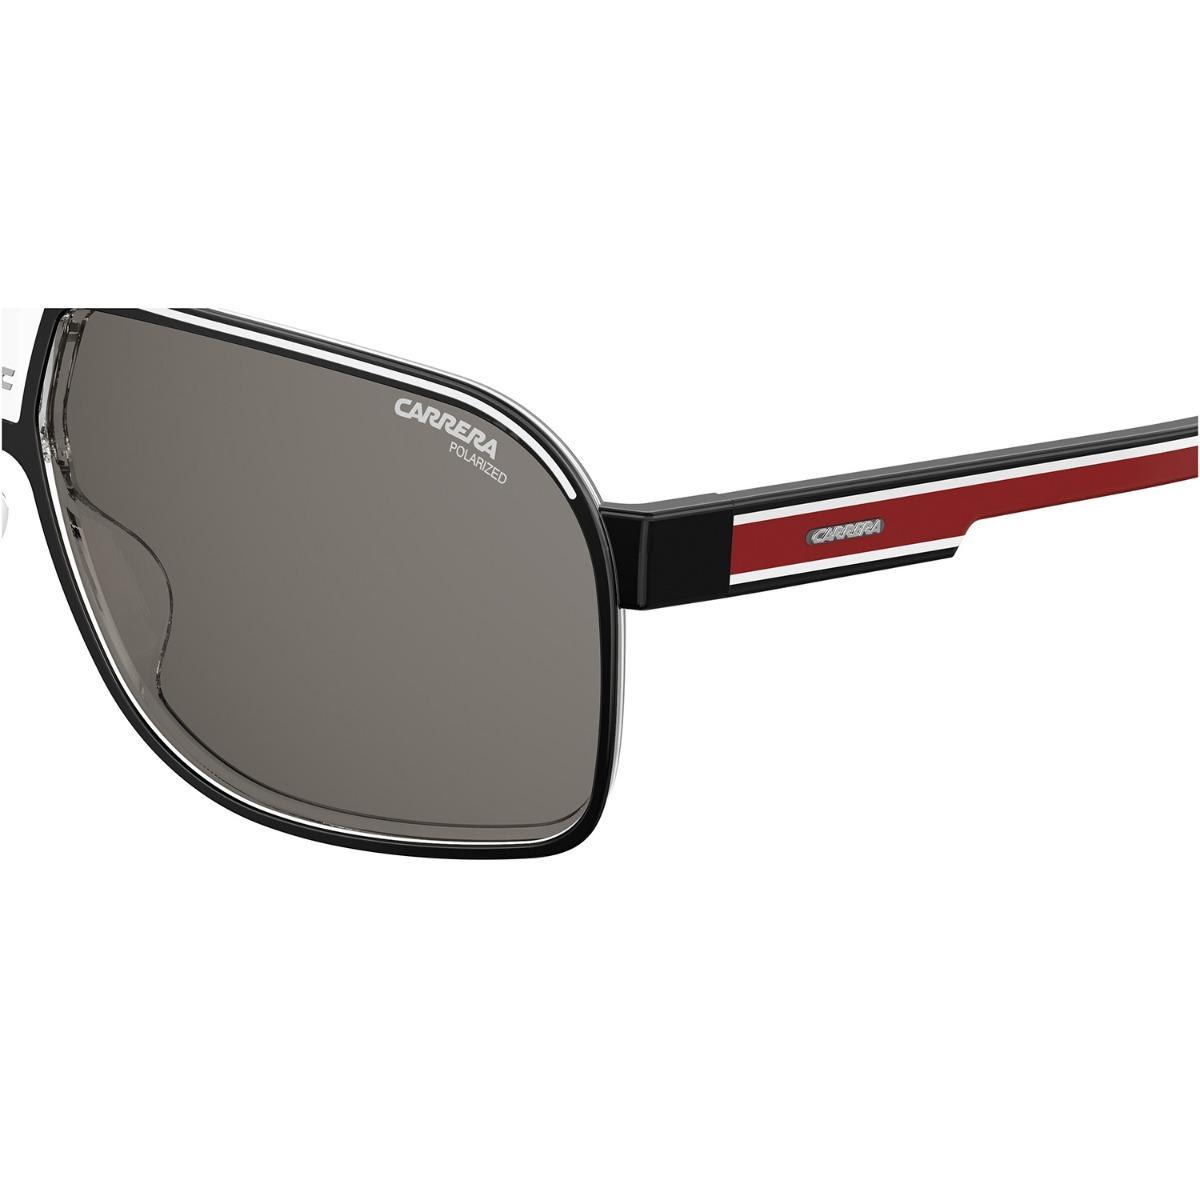 6d5e423ee8 lentes de sol carrera grand prix hombre piloto original moda. Cargando zoom.